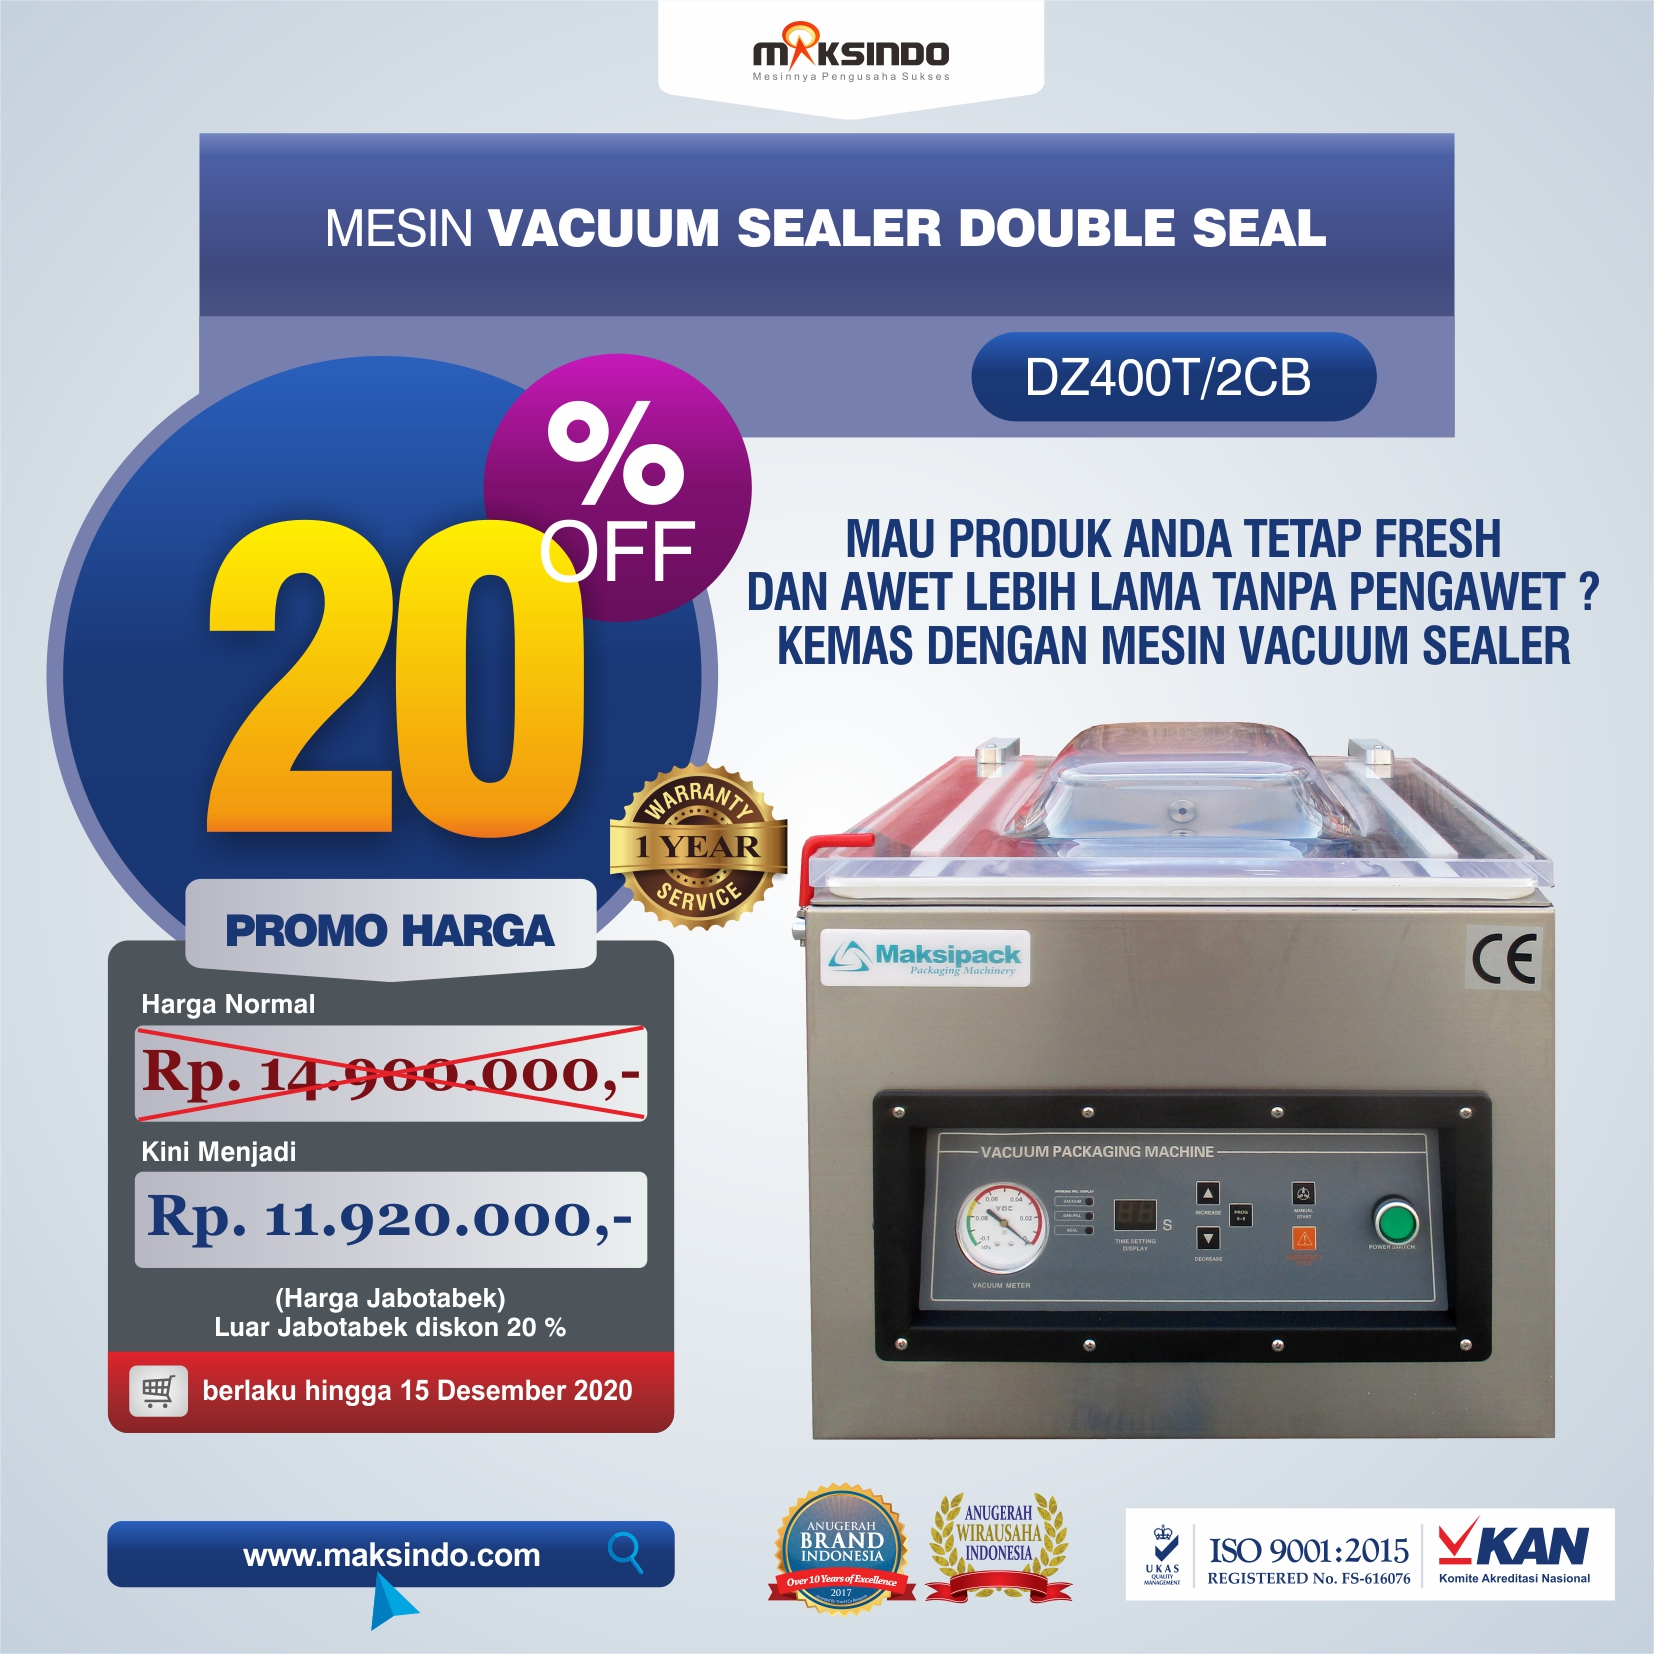 Vacuum Sealer Double Seal DZ400T/2CB